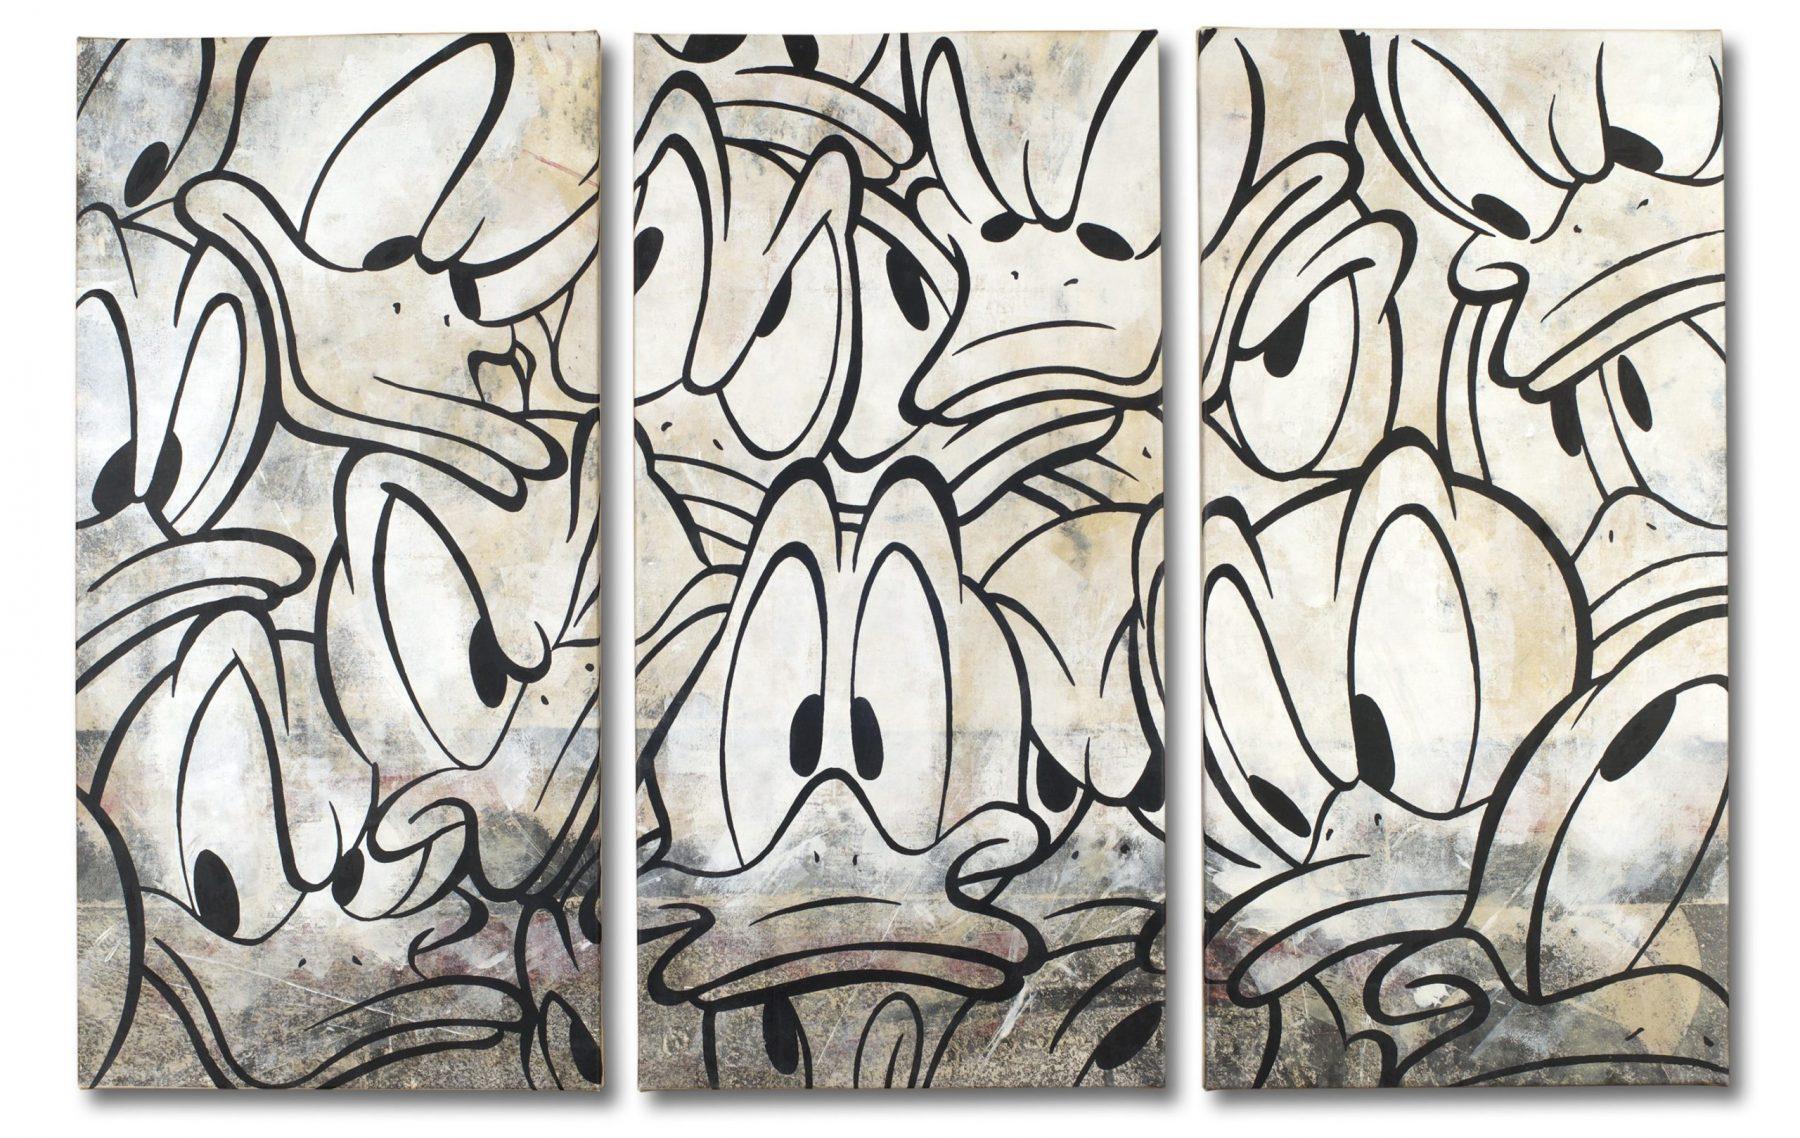 Many Ducks - Rische, Karsten - k-2009KR7